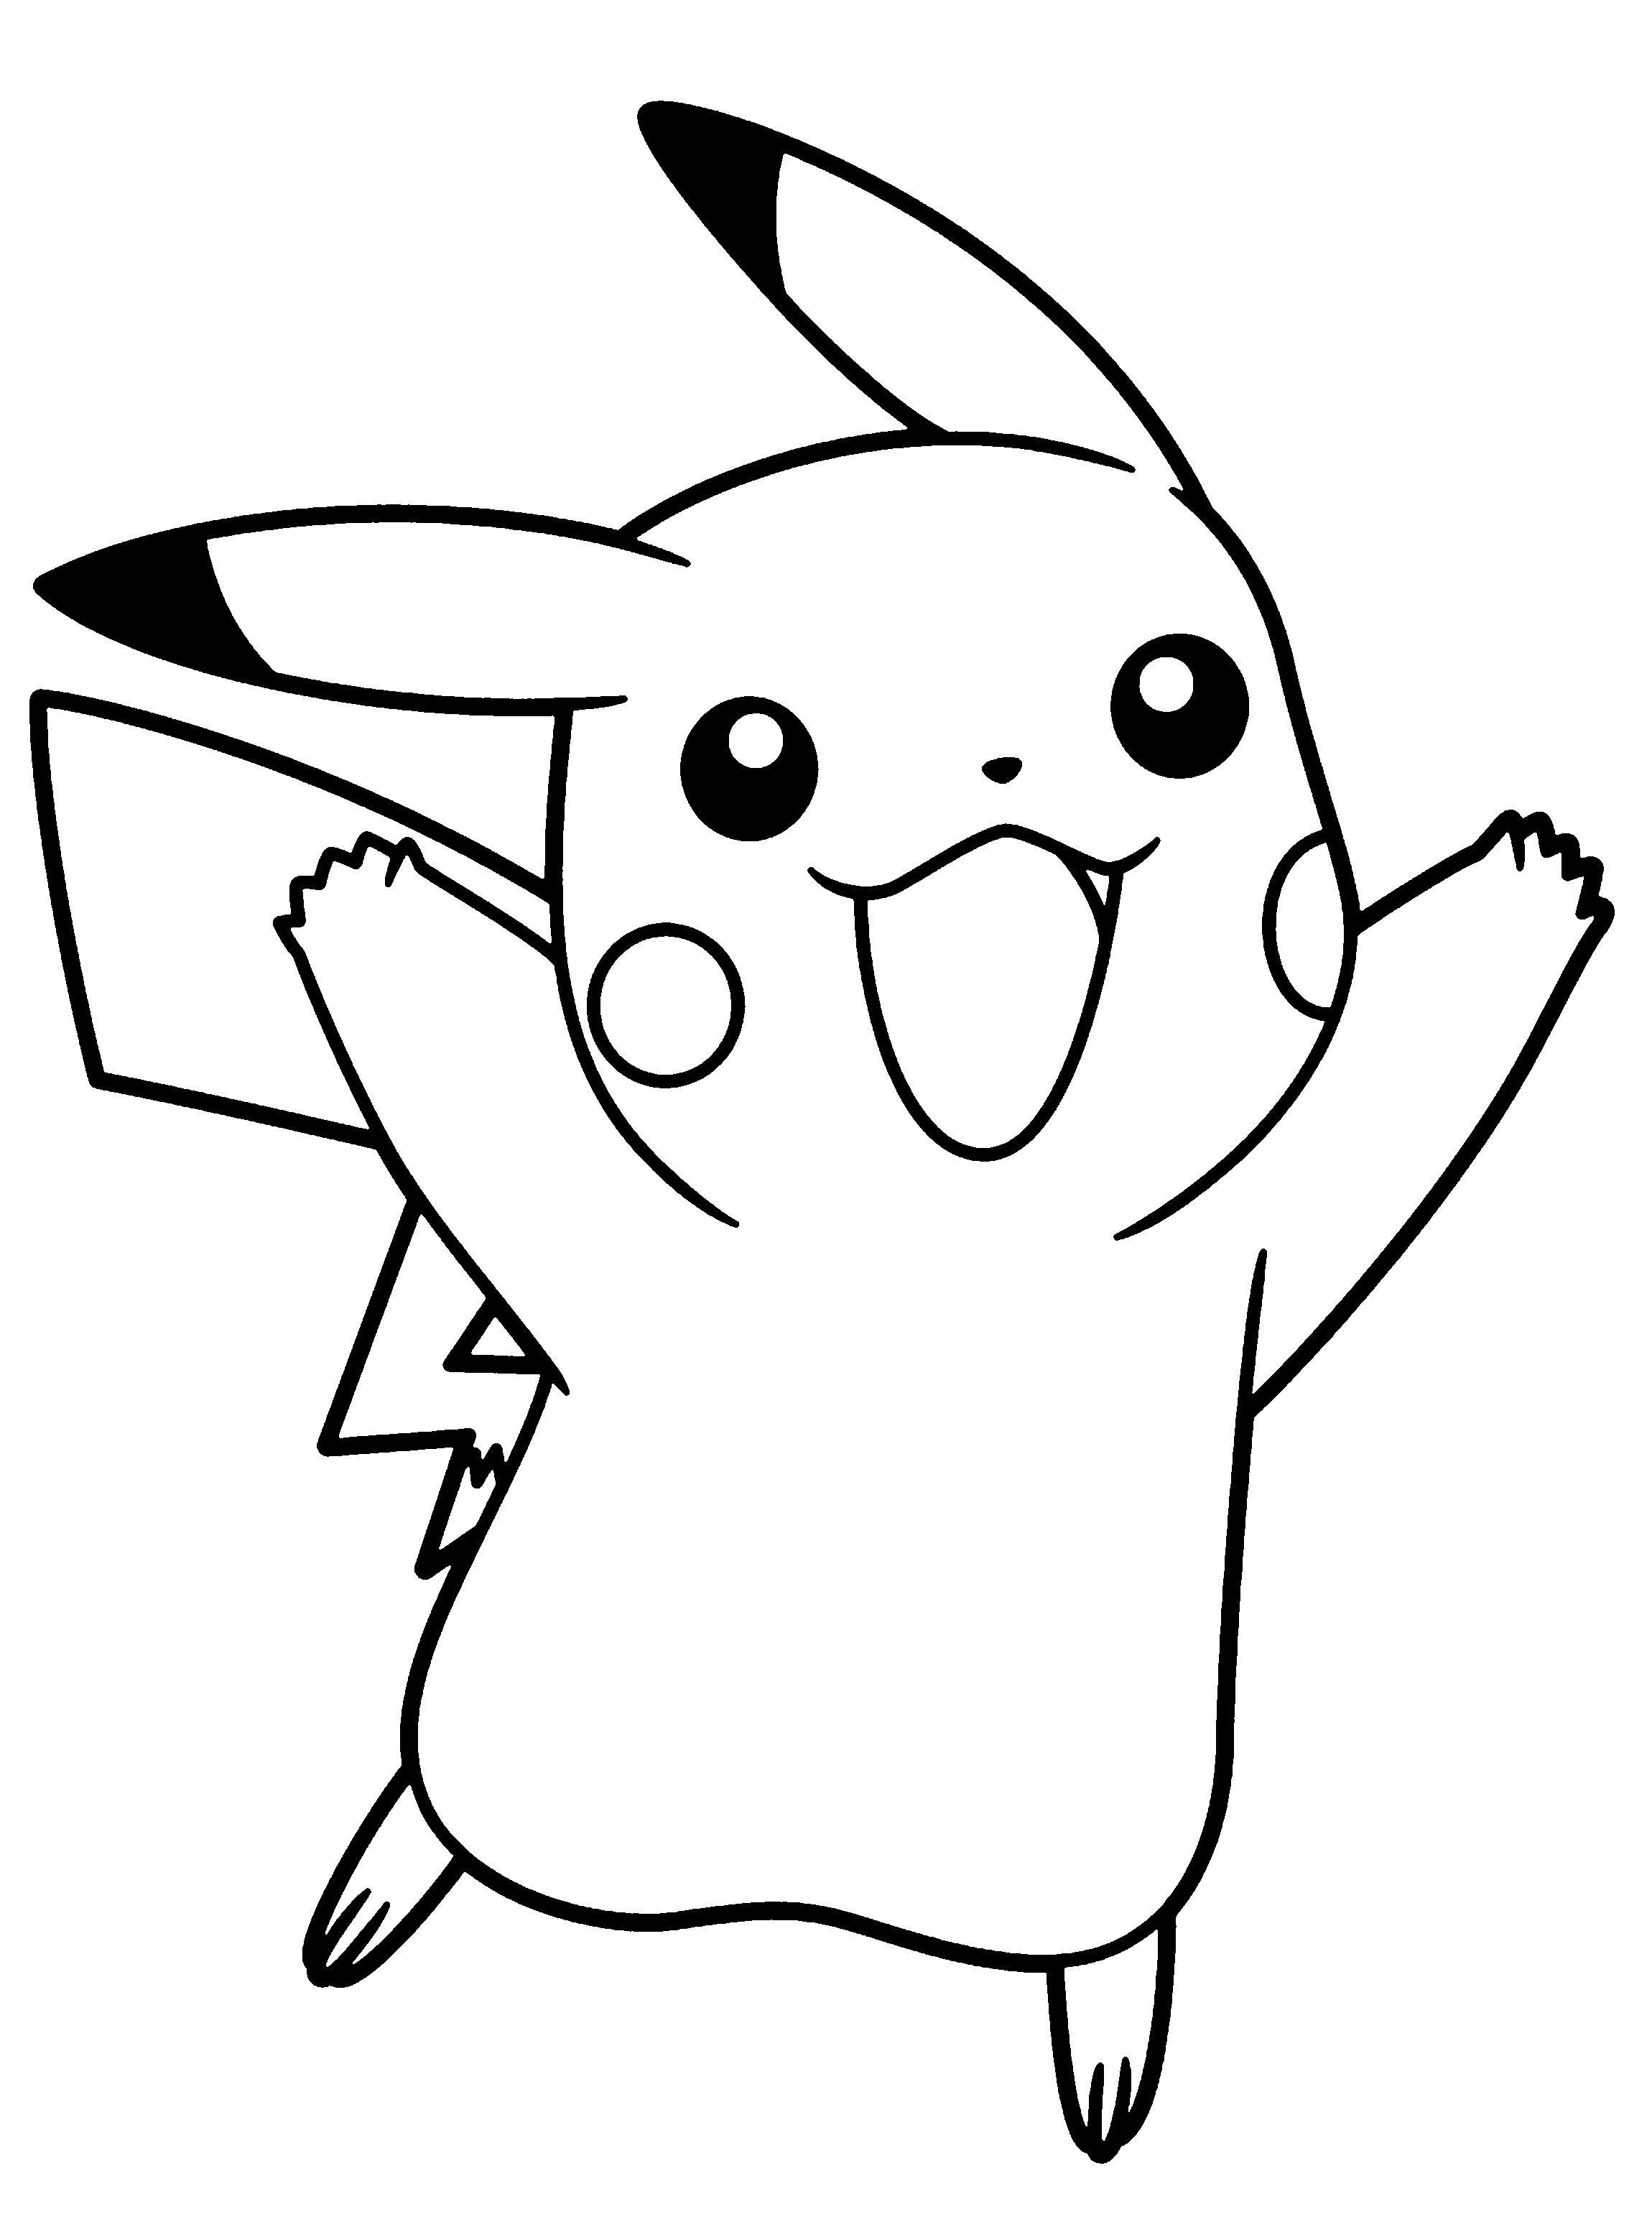 Kolorowanki Do Wydrukowania Dla Malych Dzieci In 2020 Pikachu Coloring Page Pokemon Coloring Pokemon Coloring Pages